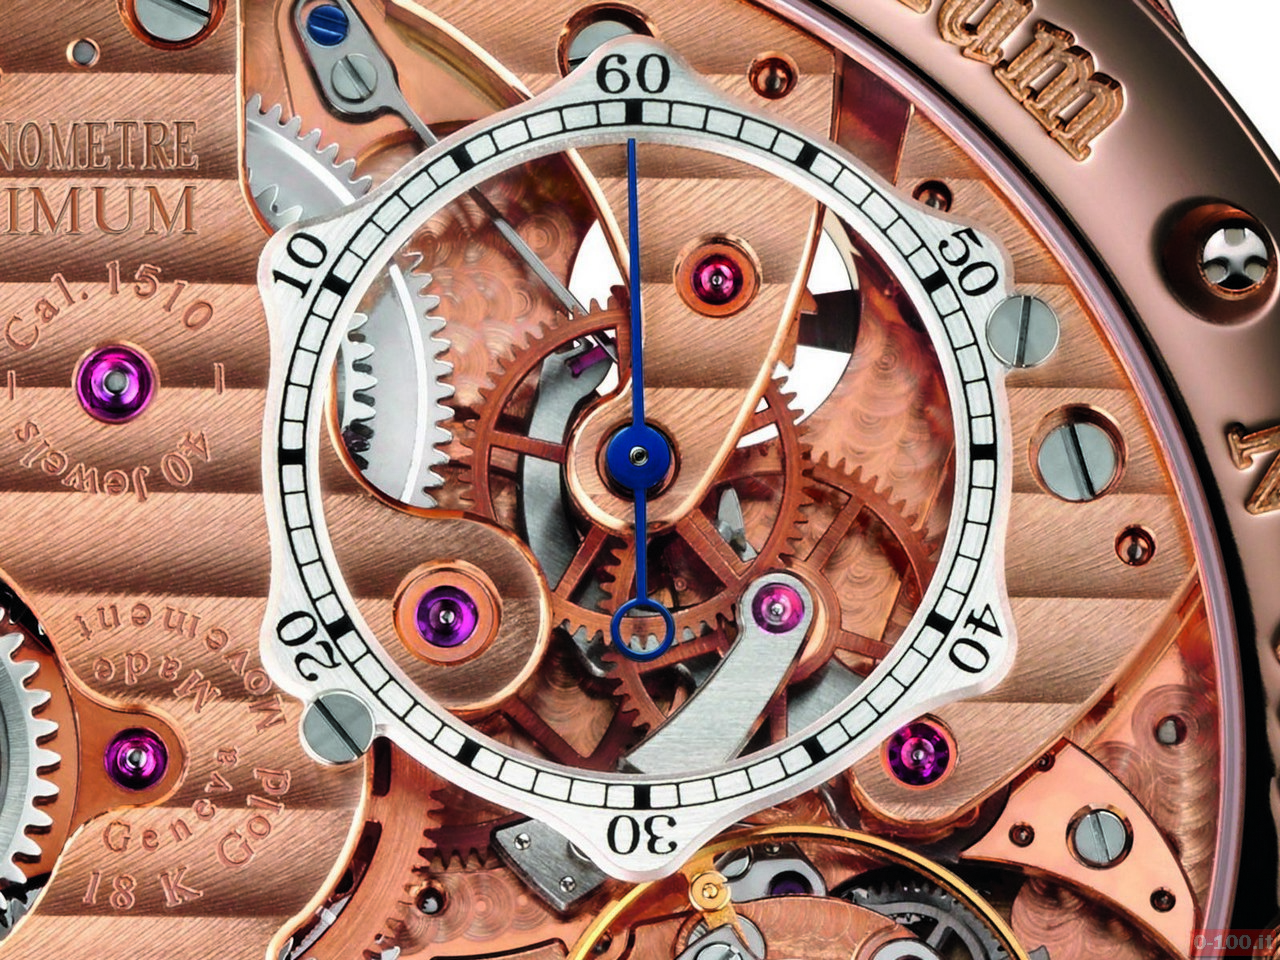 f-p-journe-chronometre-optimum-0-100_7